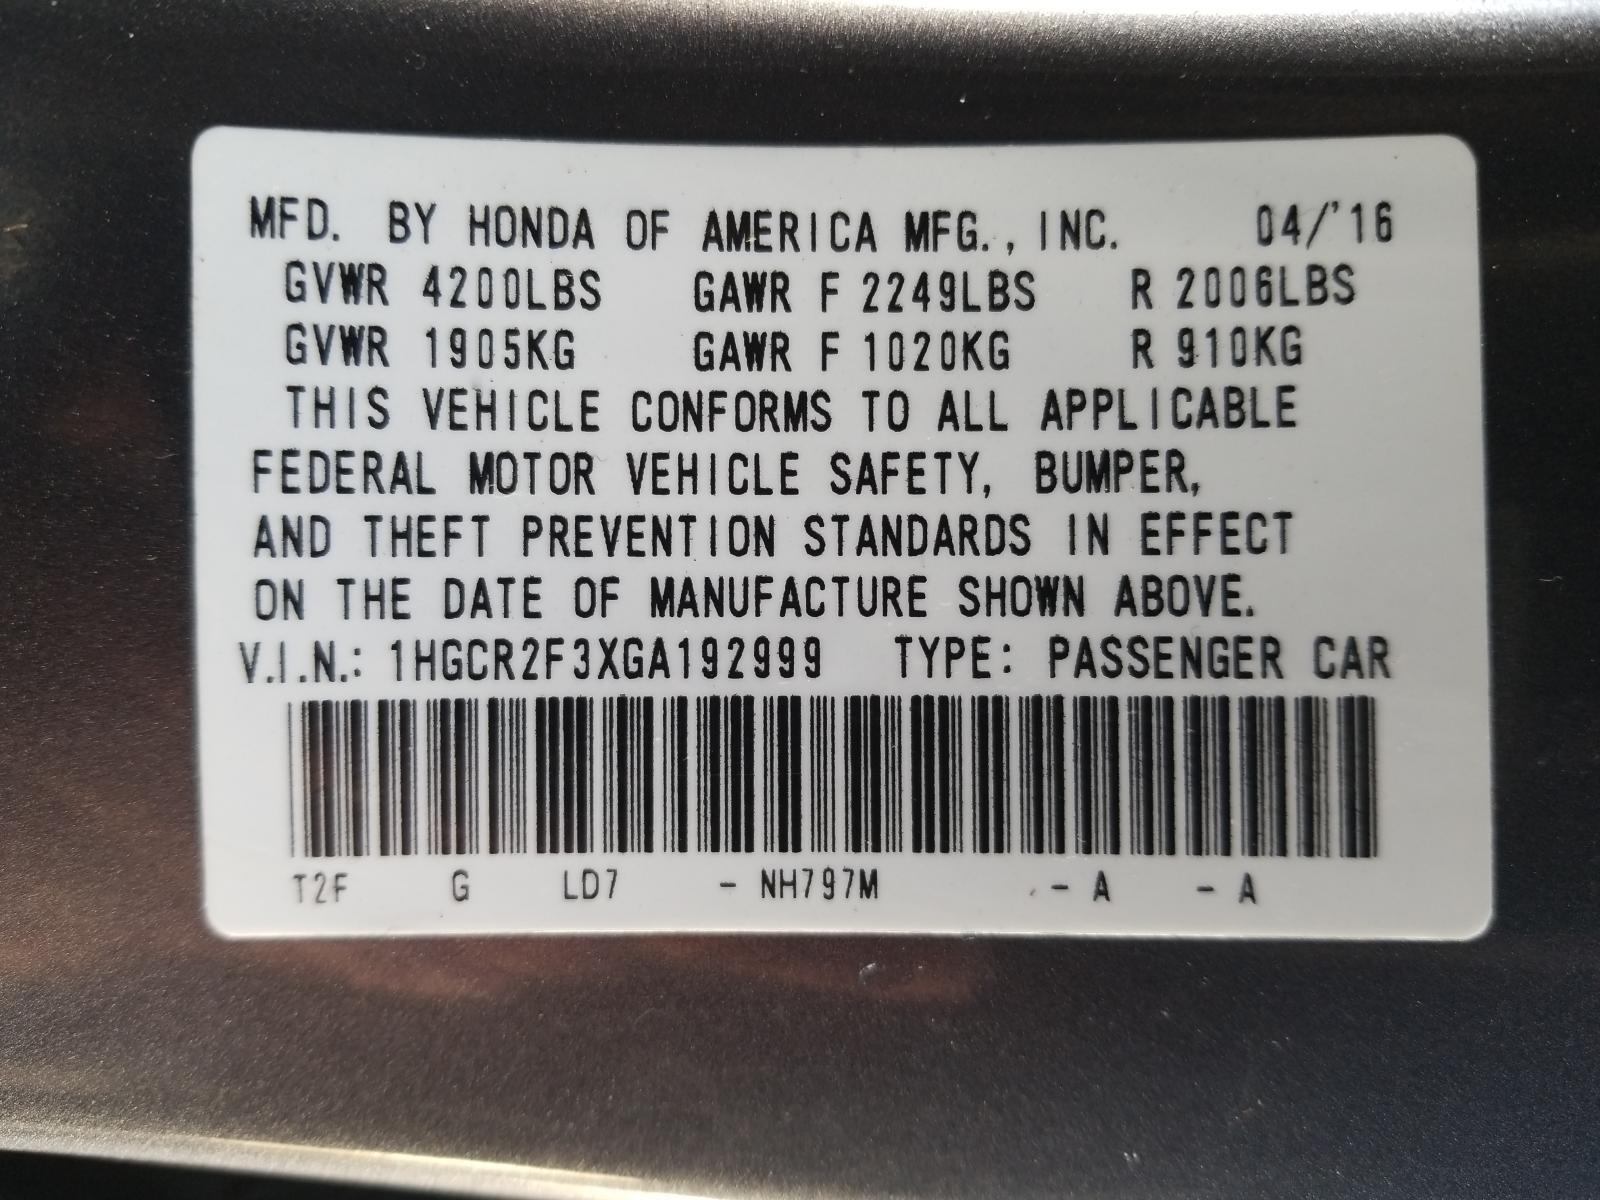 1HGCR2F3XGA192999 - 2016 Honda Accord Lx 2.4L